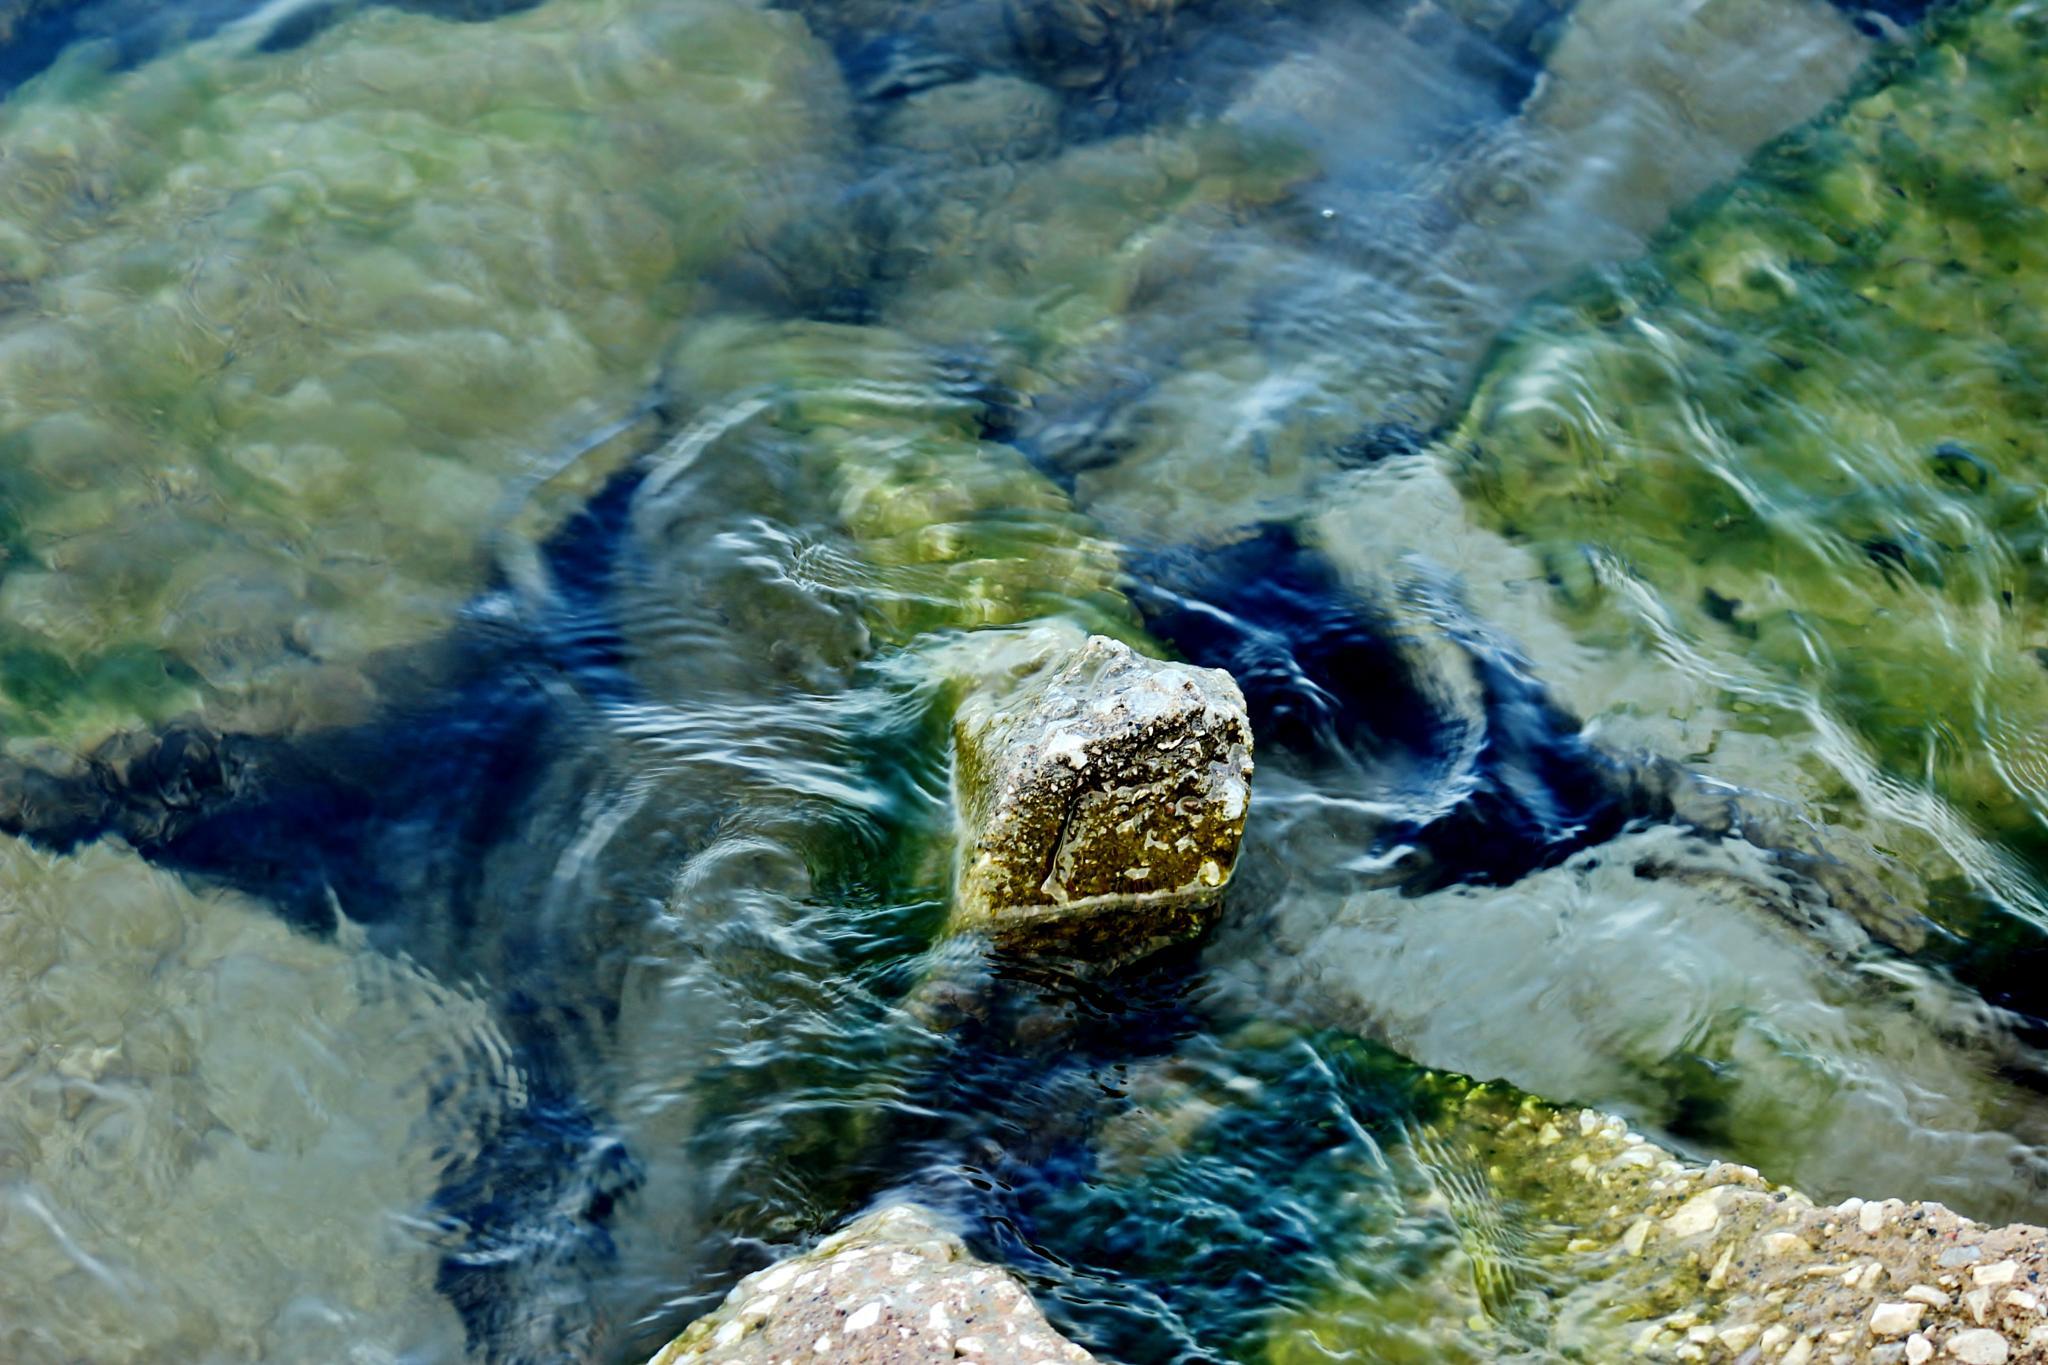 Shoreline by Angela Mead